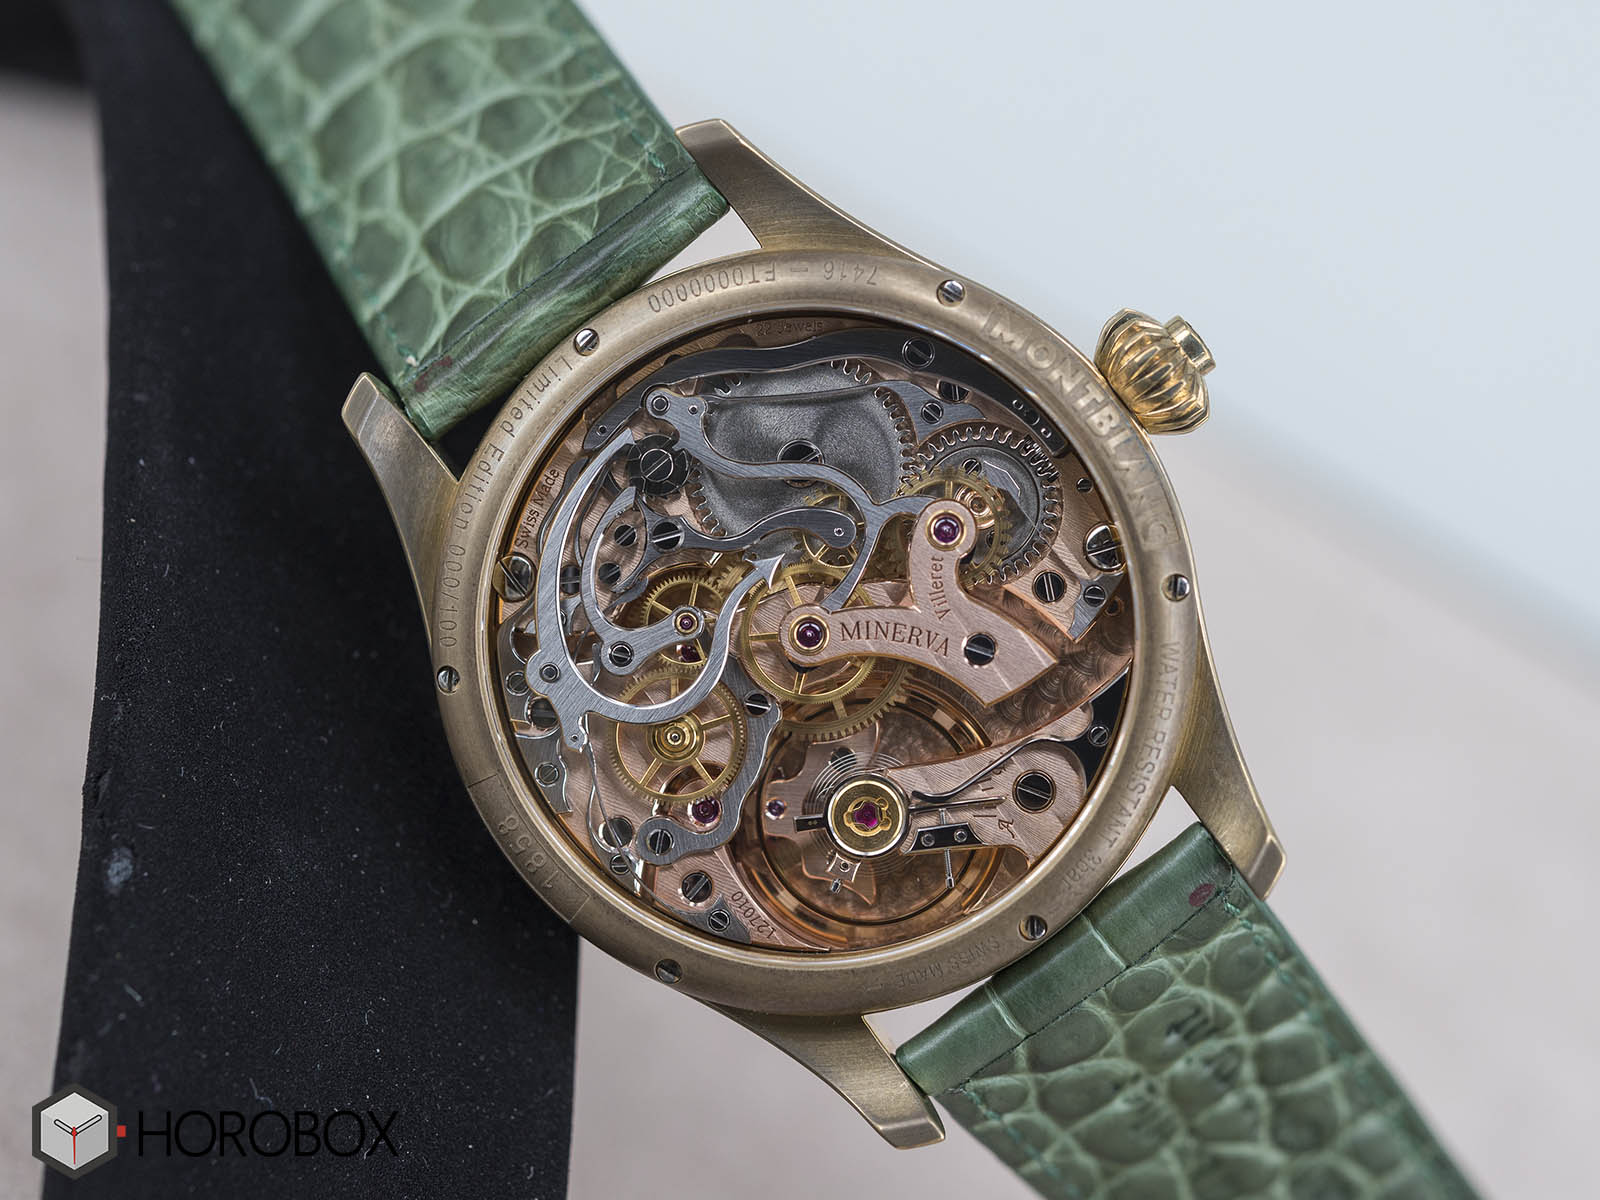 montblanc-1858-chronograph-onlywatch-bronzo-2.jpg